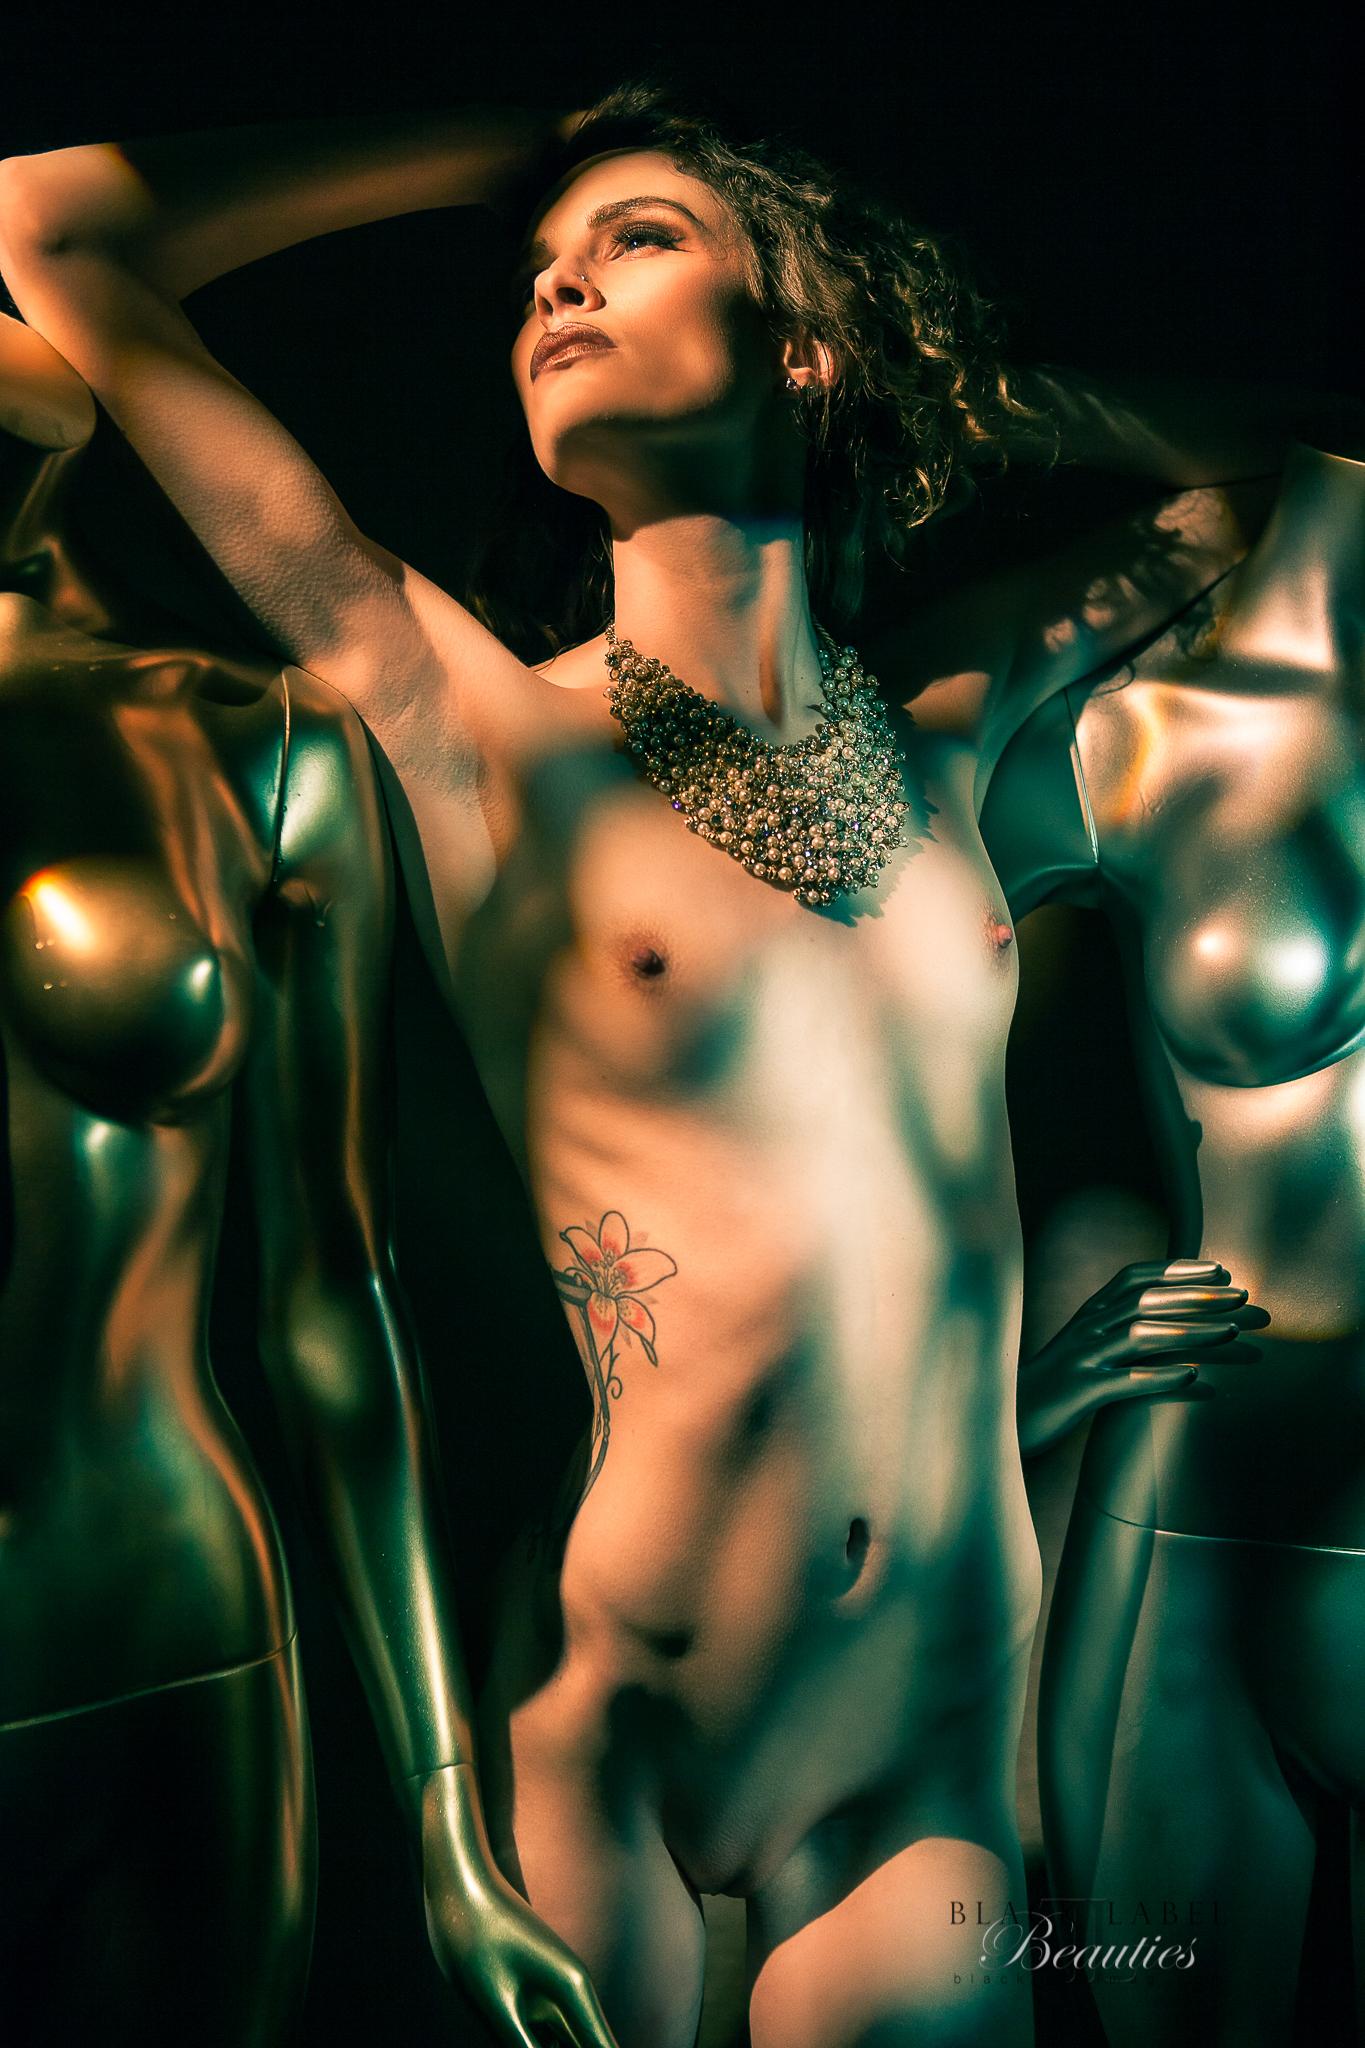 small tits, skinny girls nude, sexy women, black label magazine